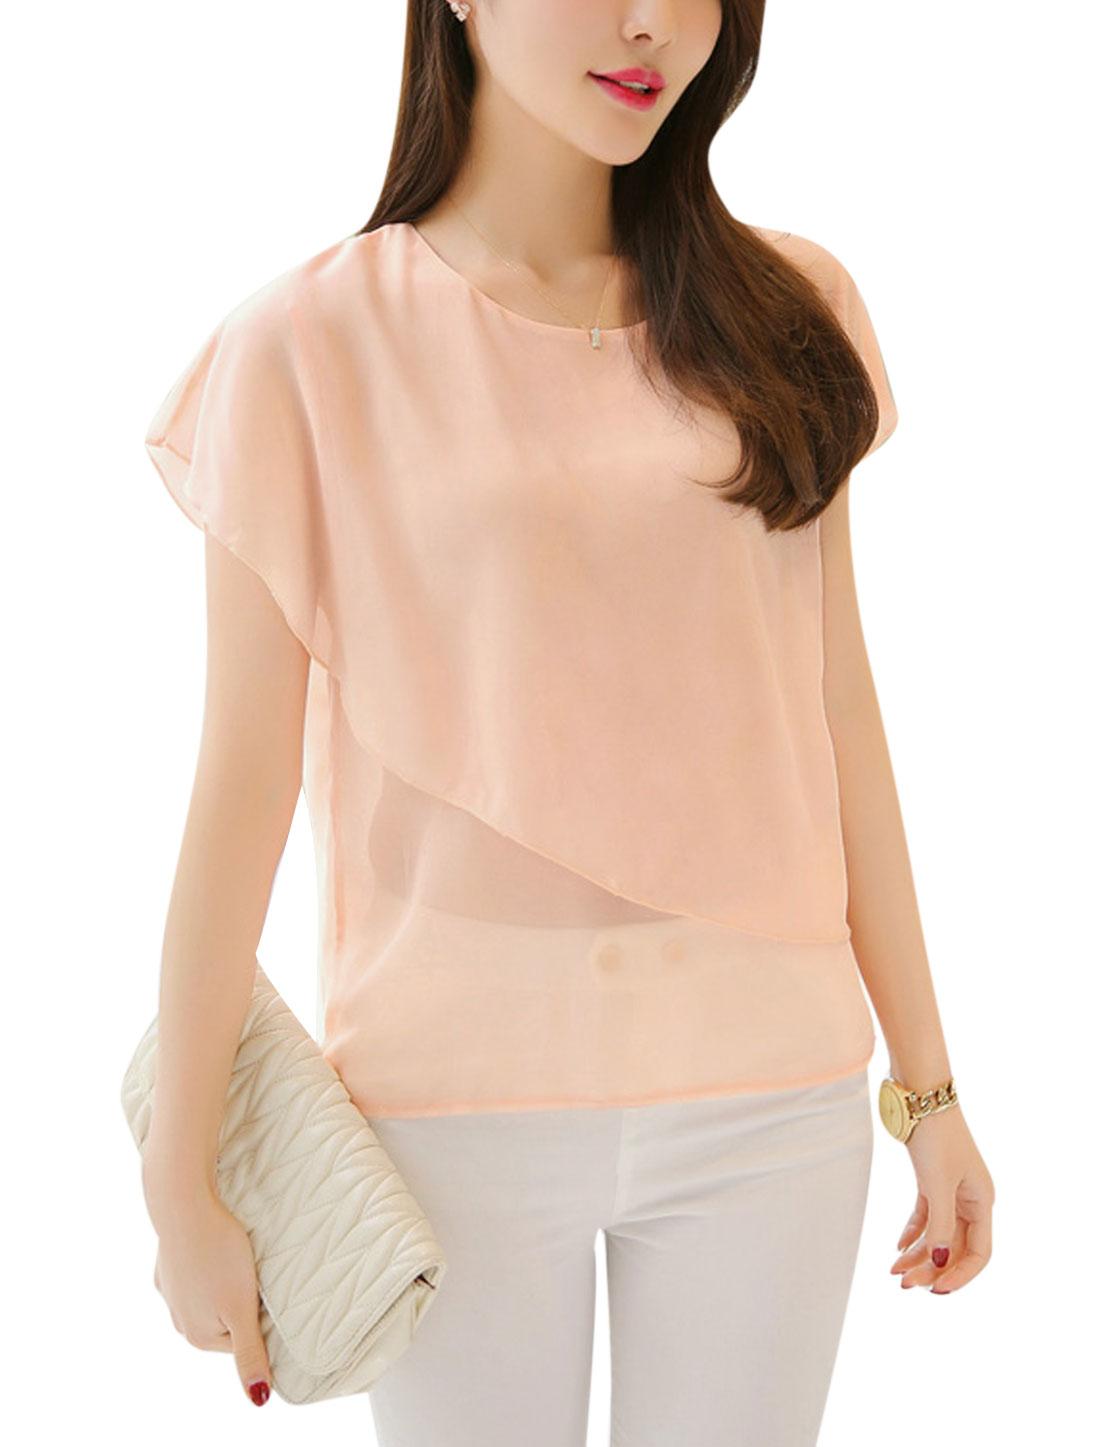 Women Short Sleeves Round Neck Chiffon Tops Pale Pink XS